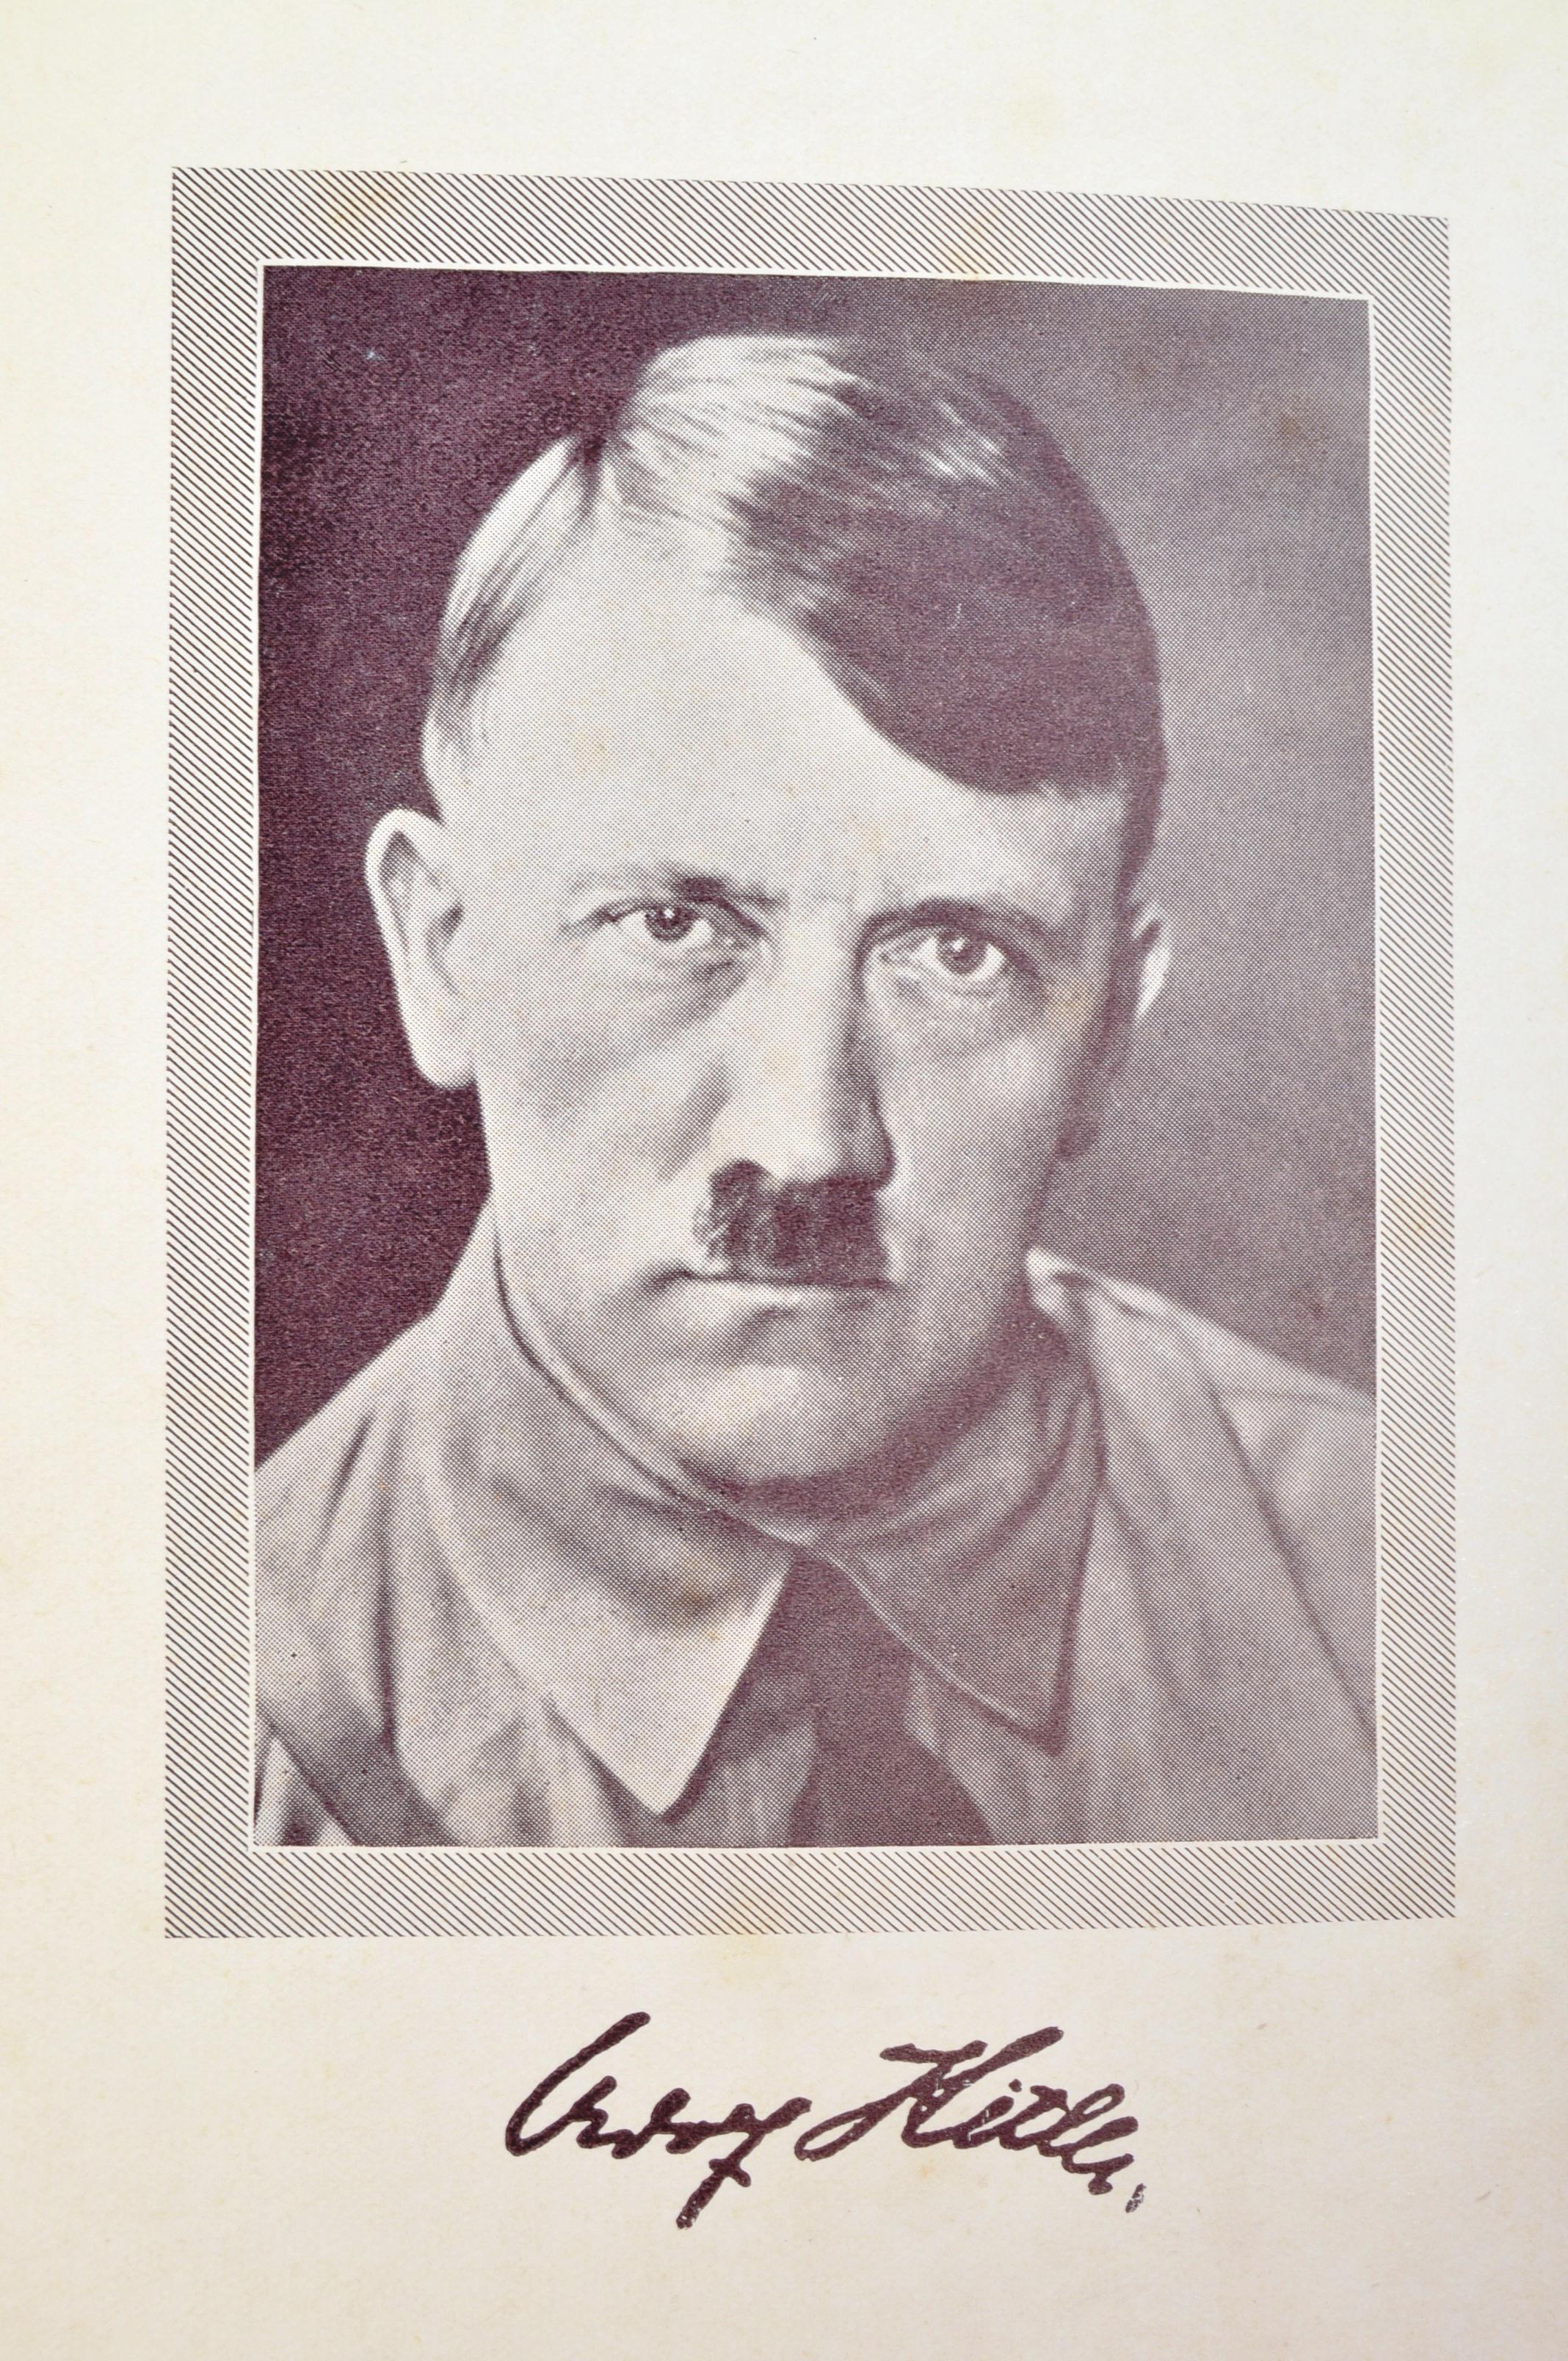 ADOLF HITLER - MEIN KAMPF - 1ST ENGLISH EDITION 1939 - Image 2 of 9